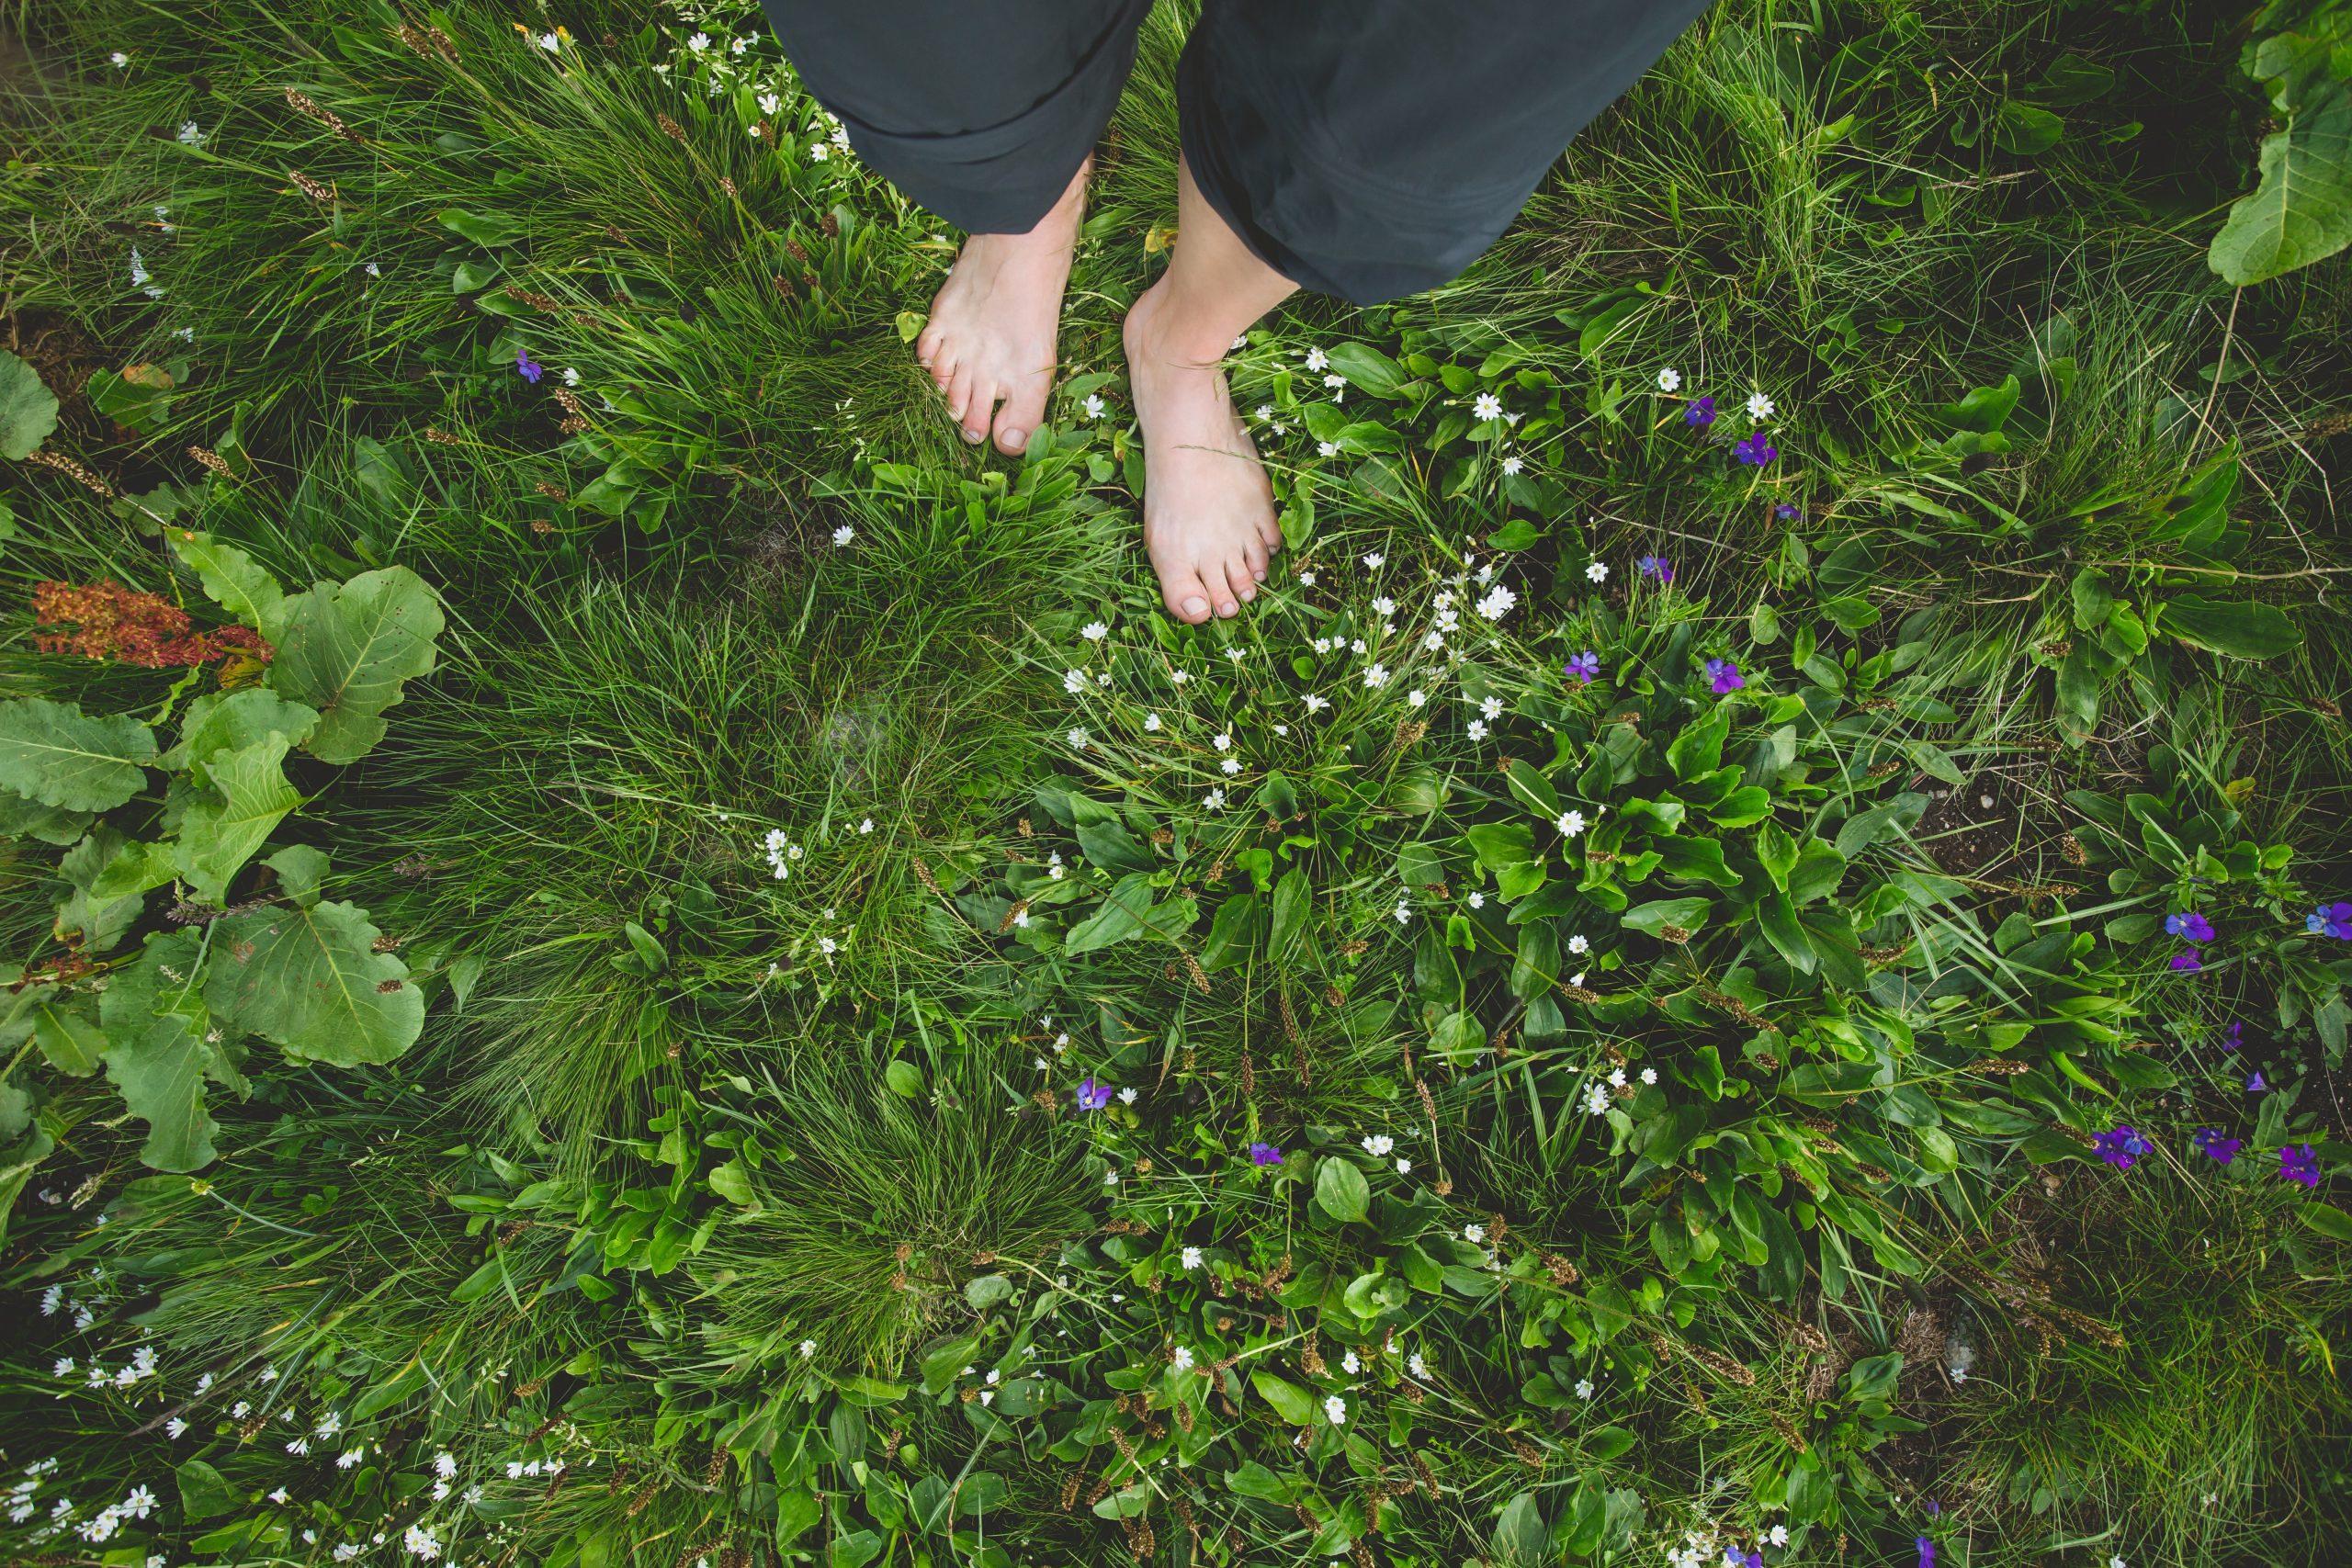 pieds-femme-herbes-deceleration-camp